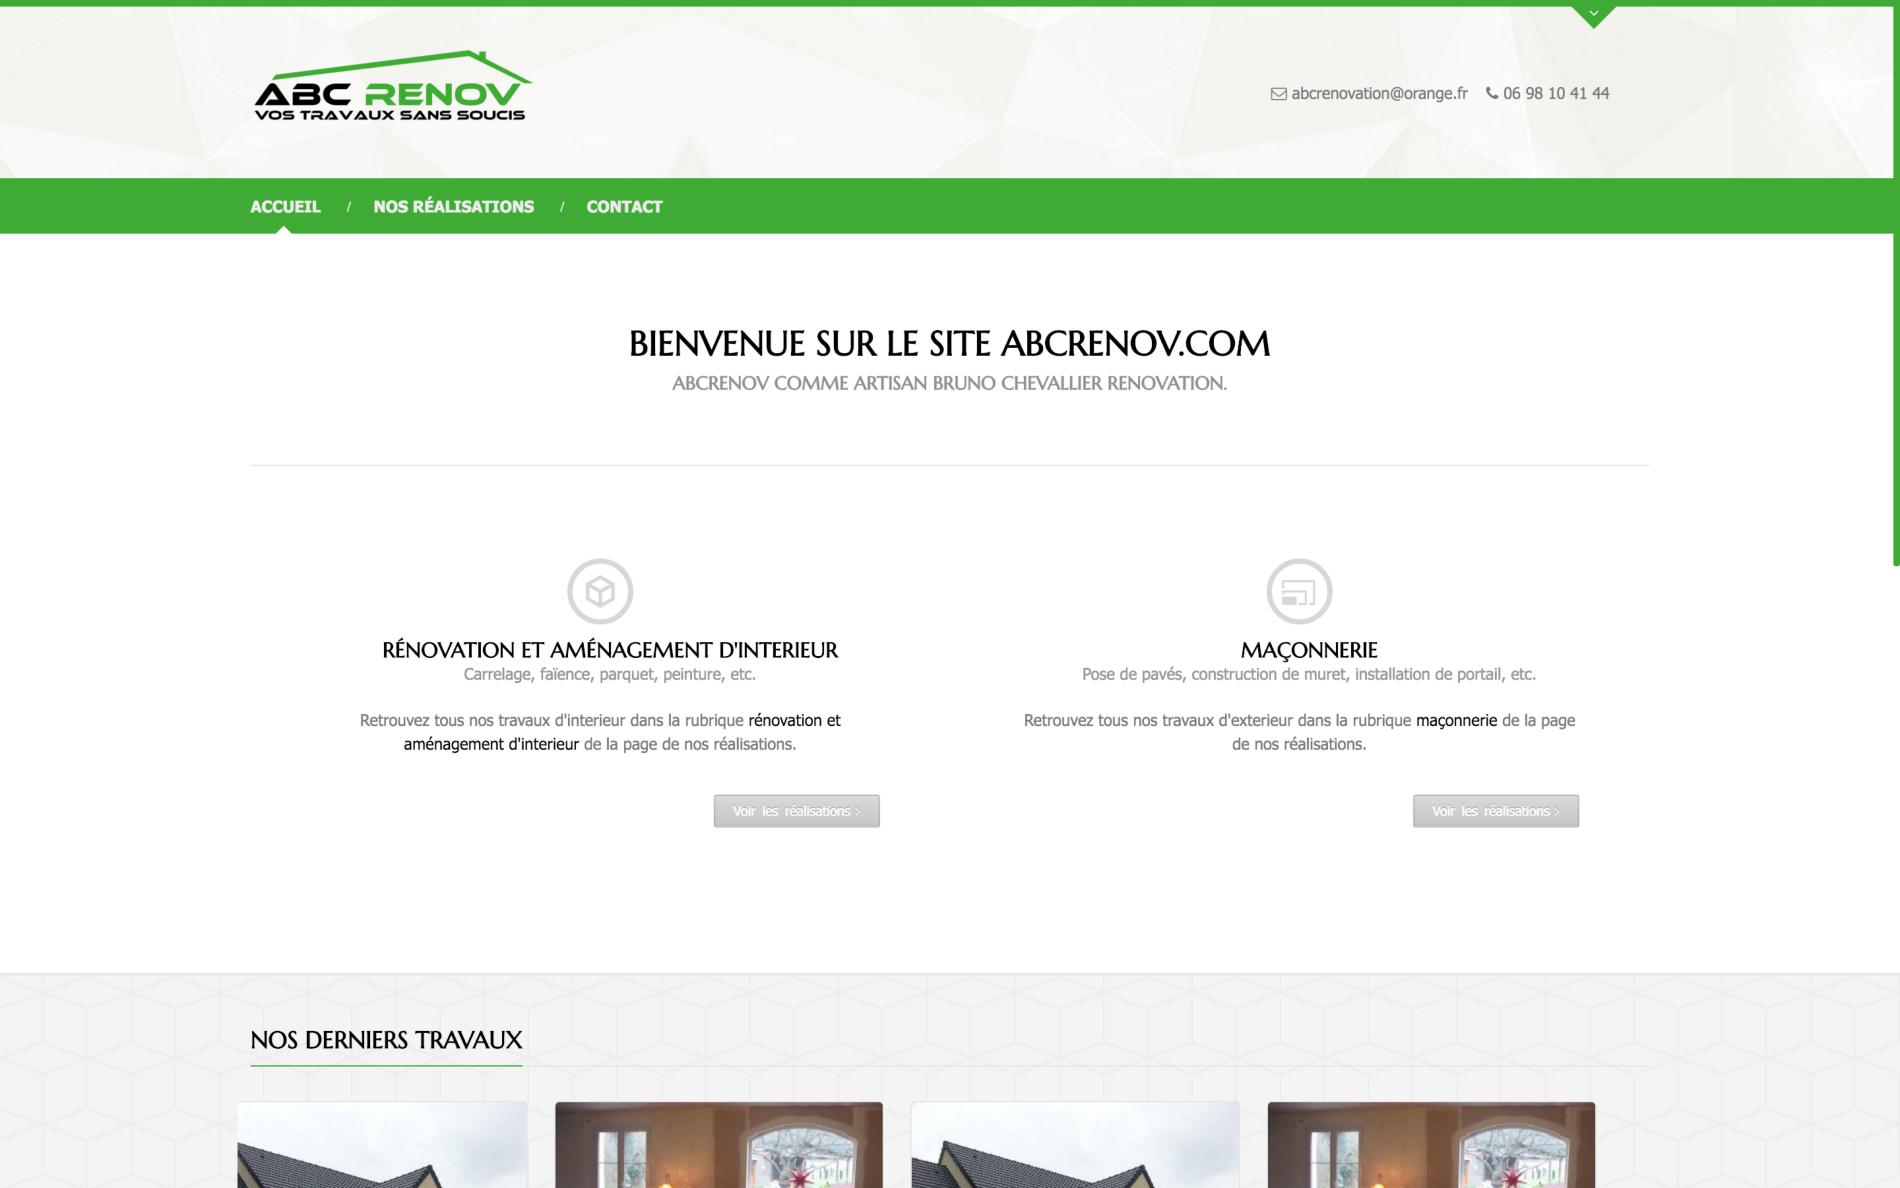 Brand Imaging creation for ABC Renov - David Ronchaud